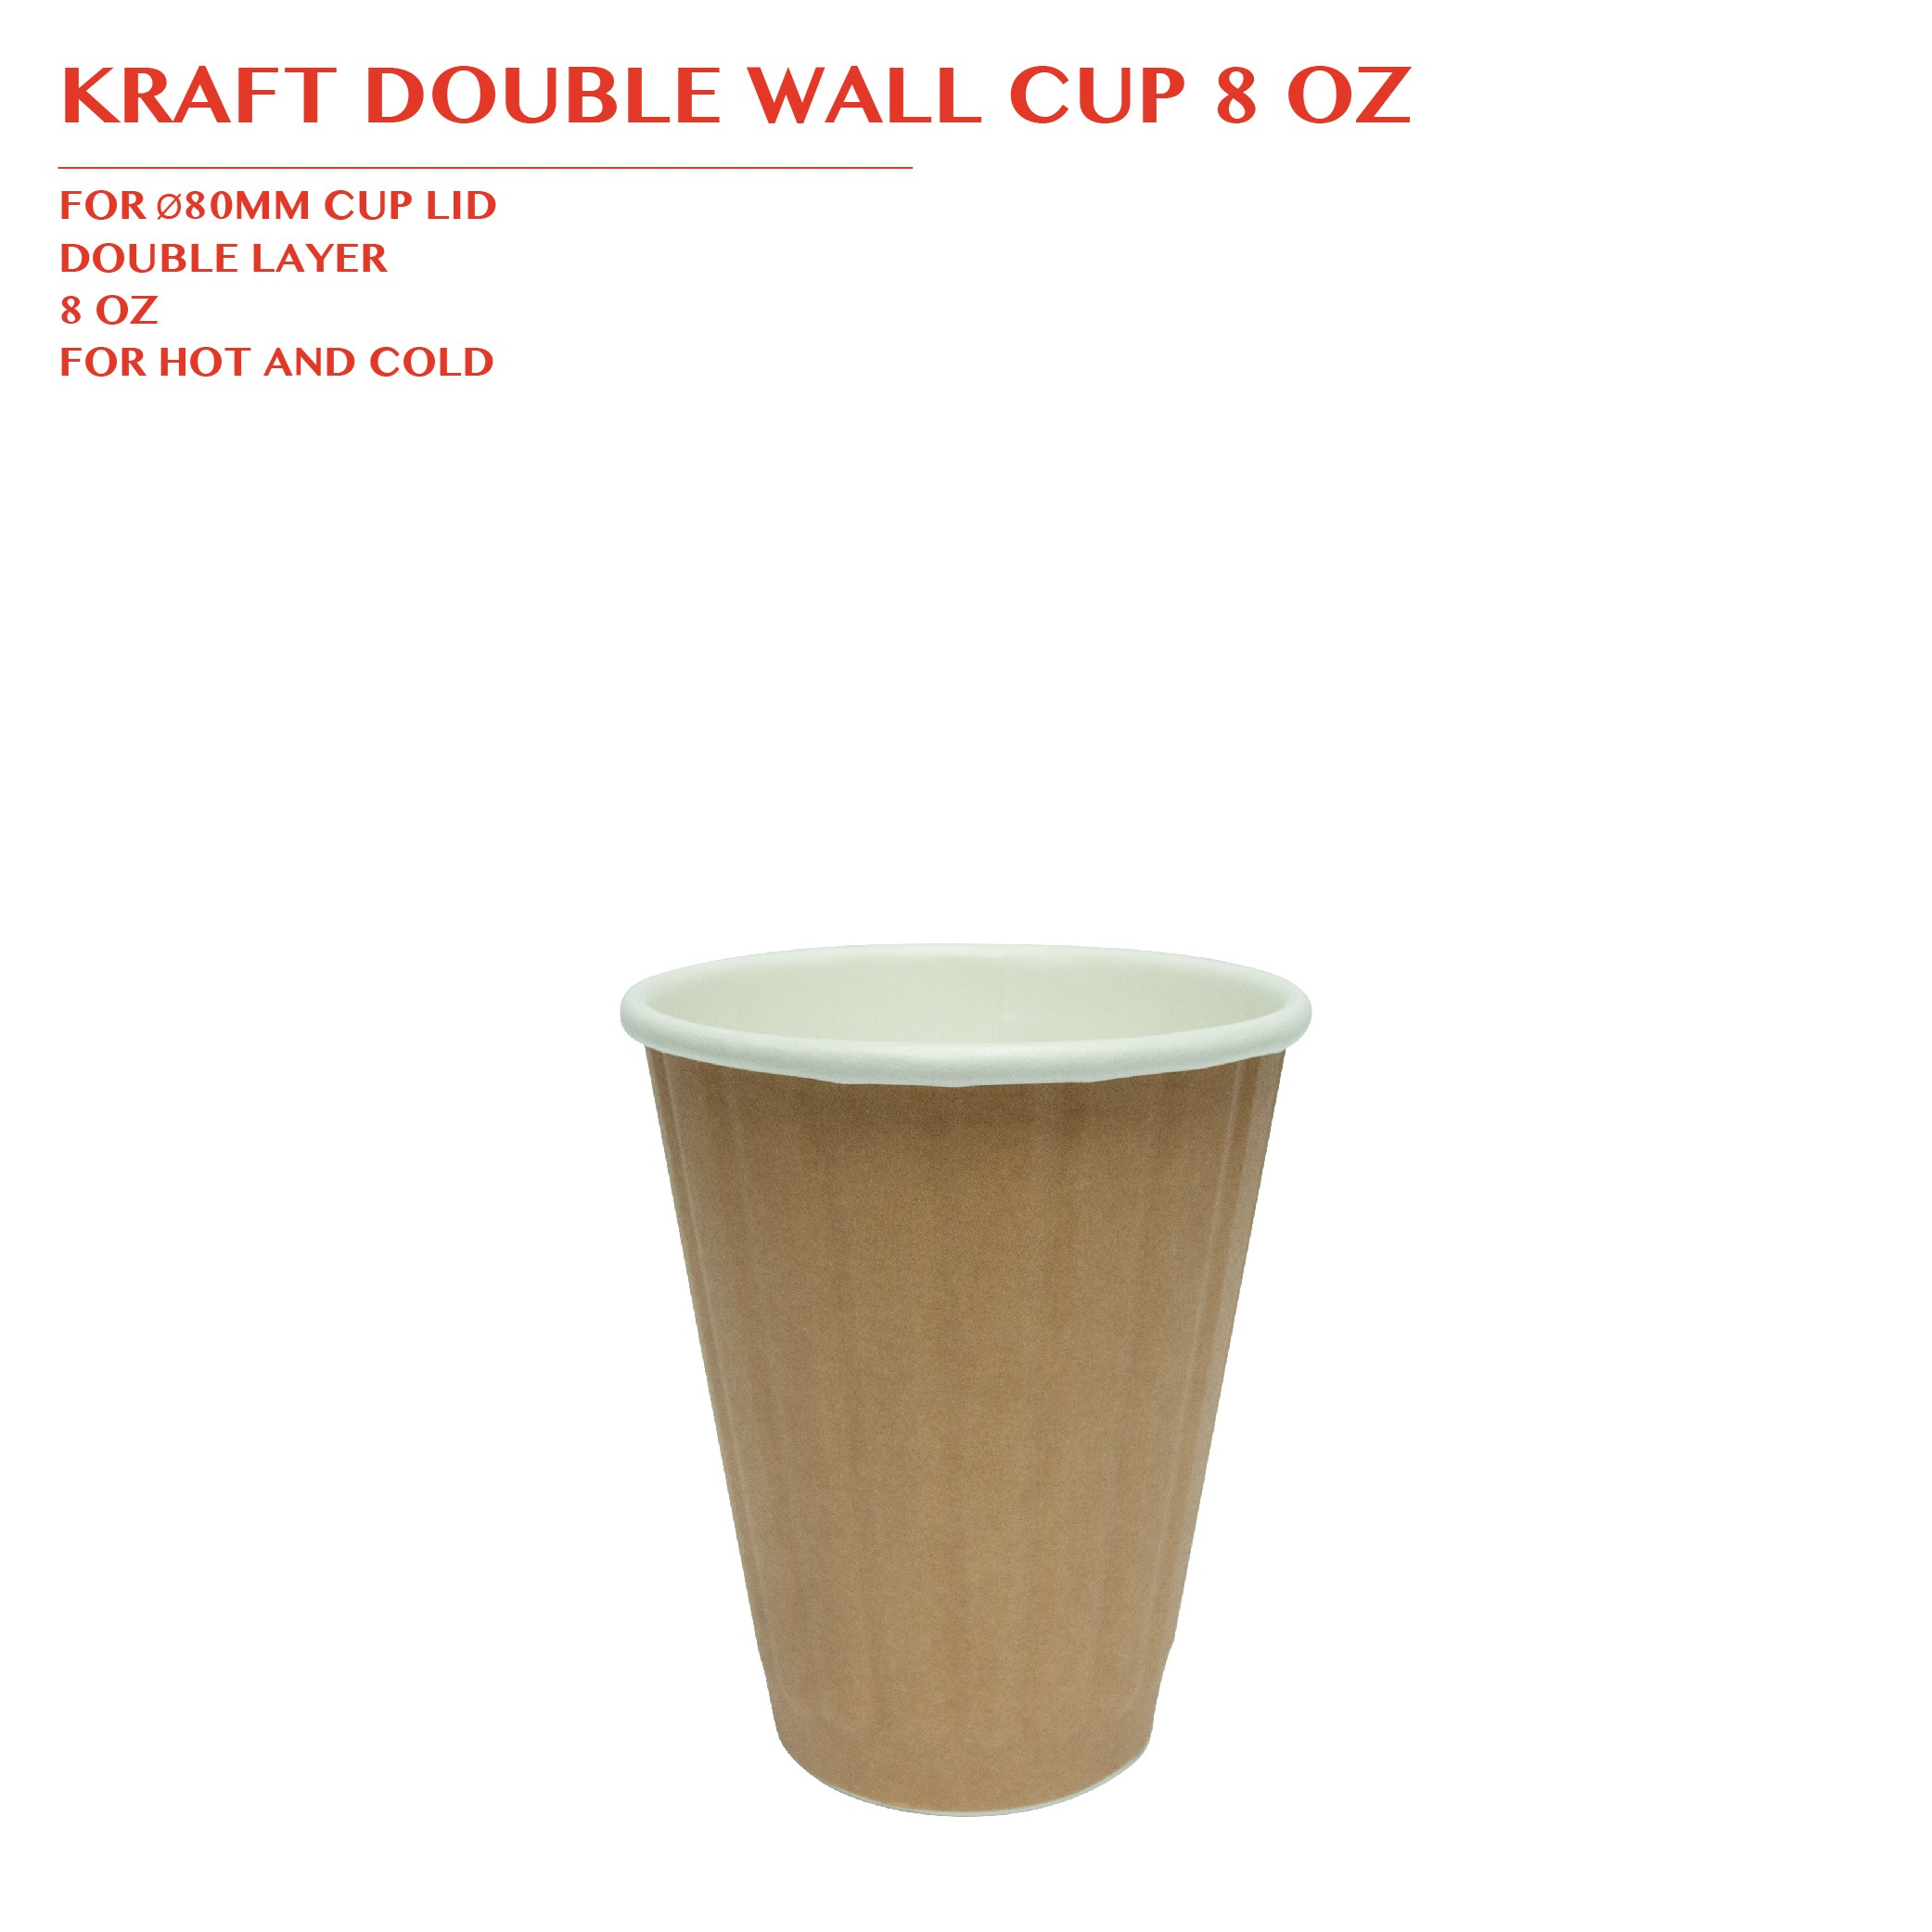 PRE-ORDER KRAFT DOUBLE WALL CUP 8 OZ 1000PCS/CTN